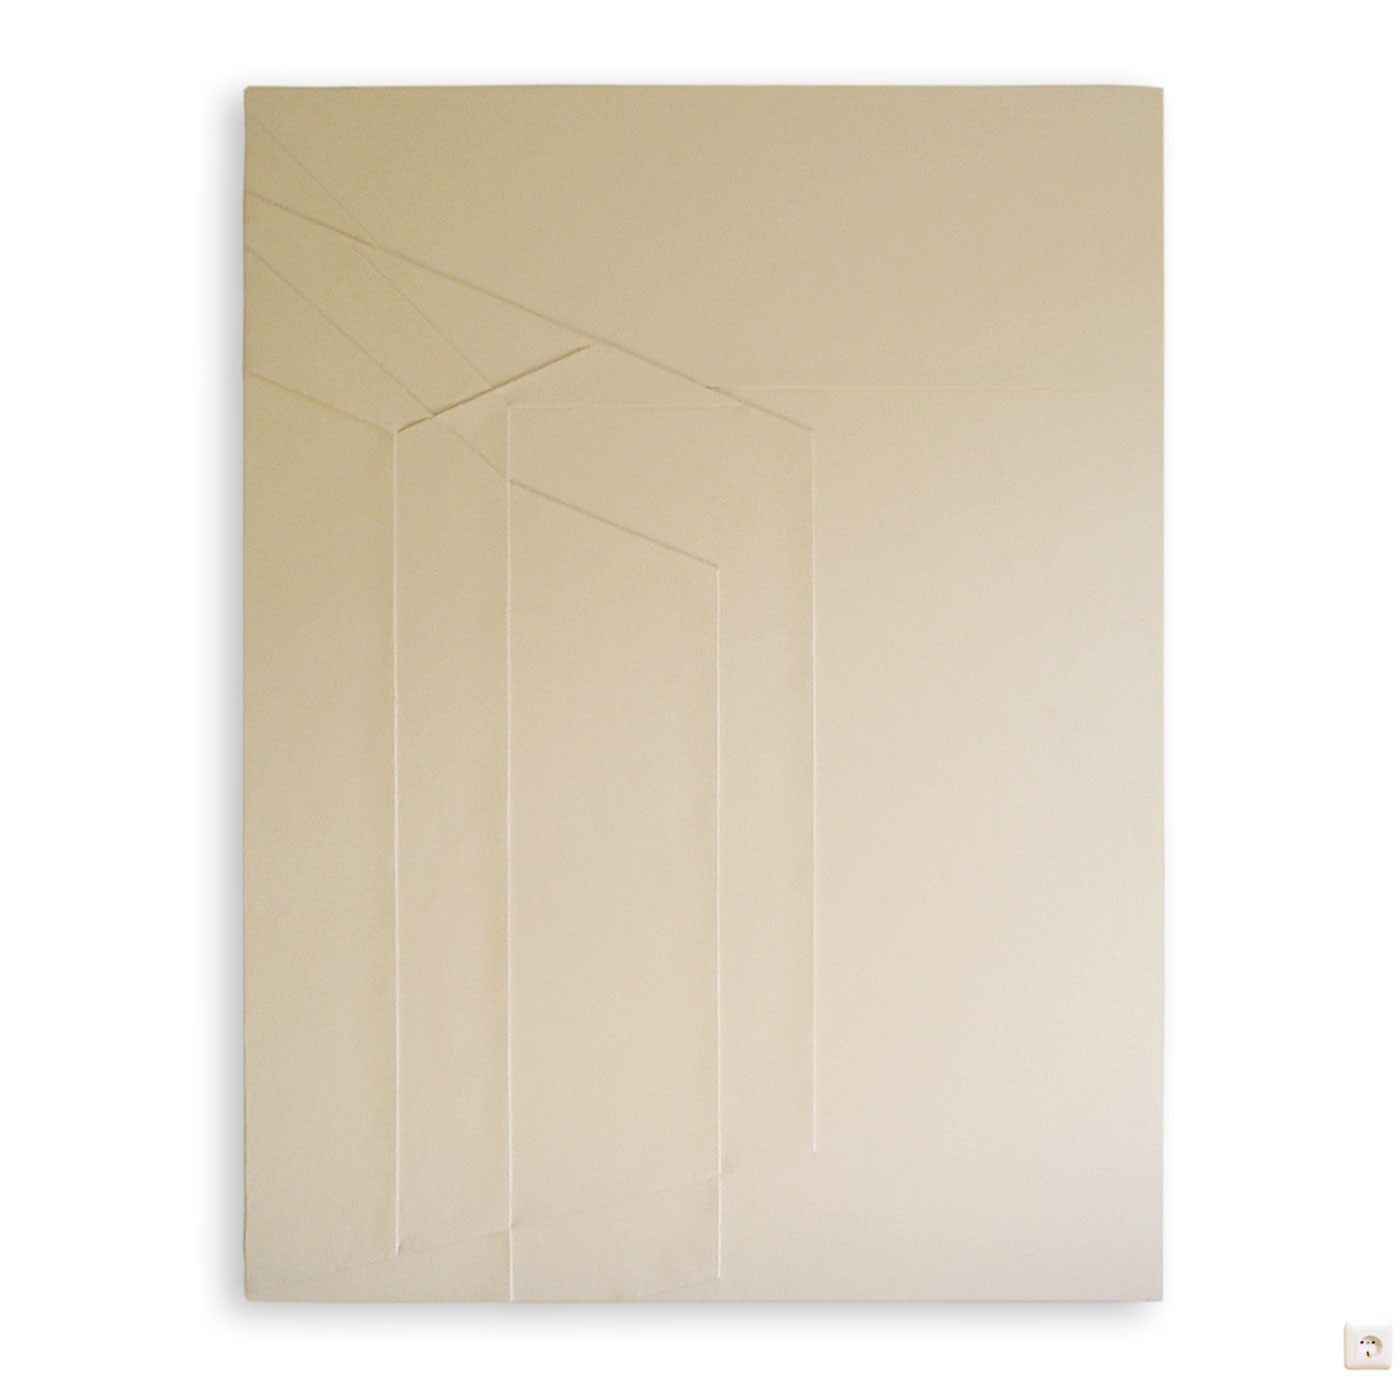 2D-3D II, © 2003, hardboard, acrylic filler, acrylic paint, 200 x 140 x 5 cm